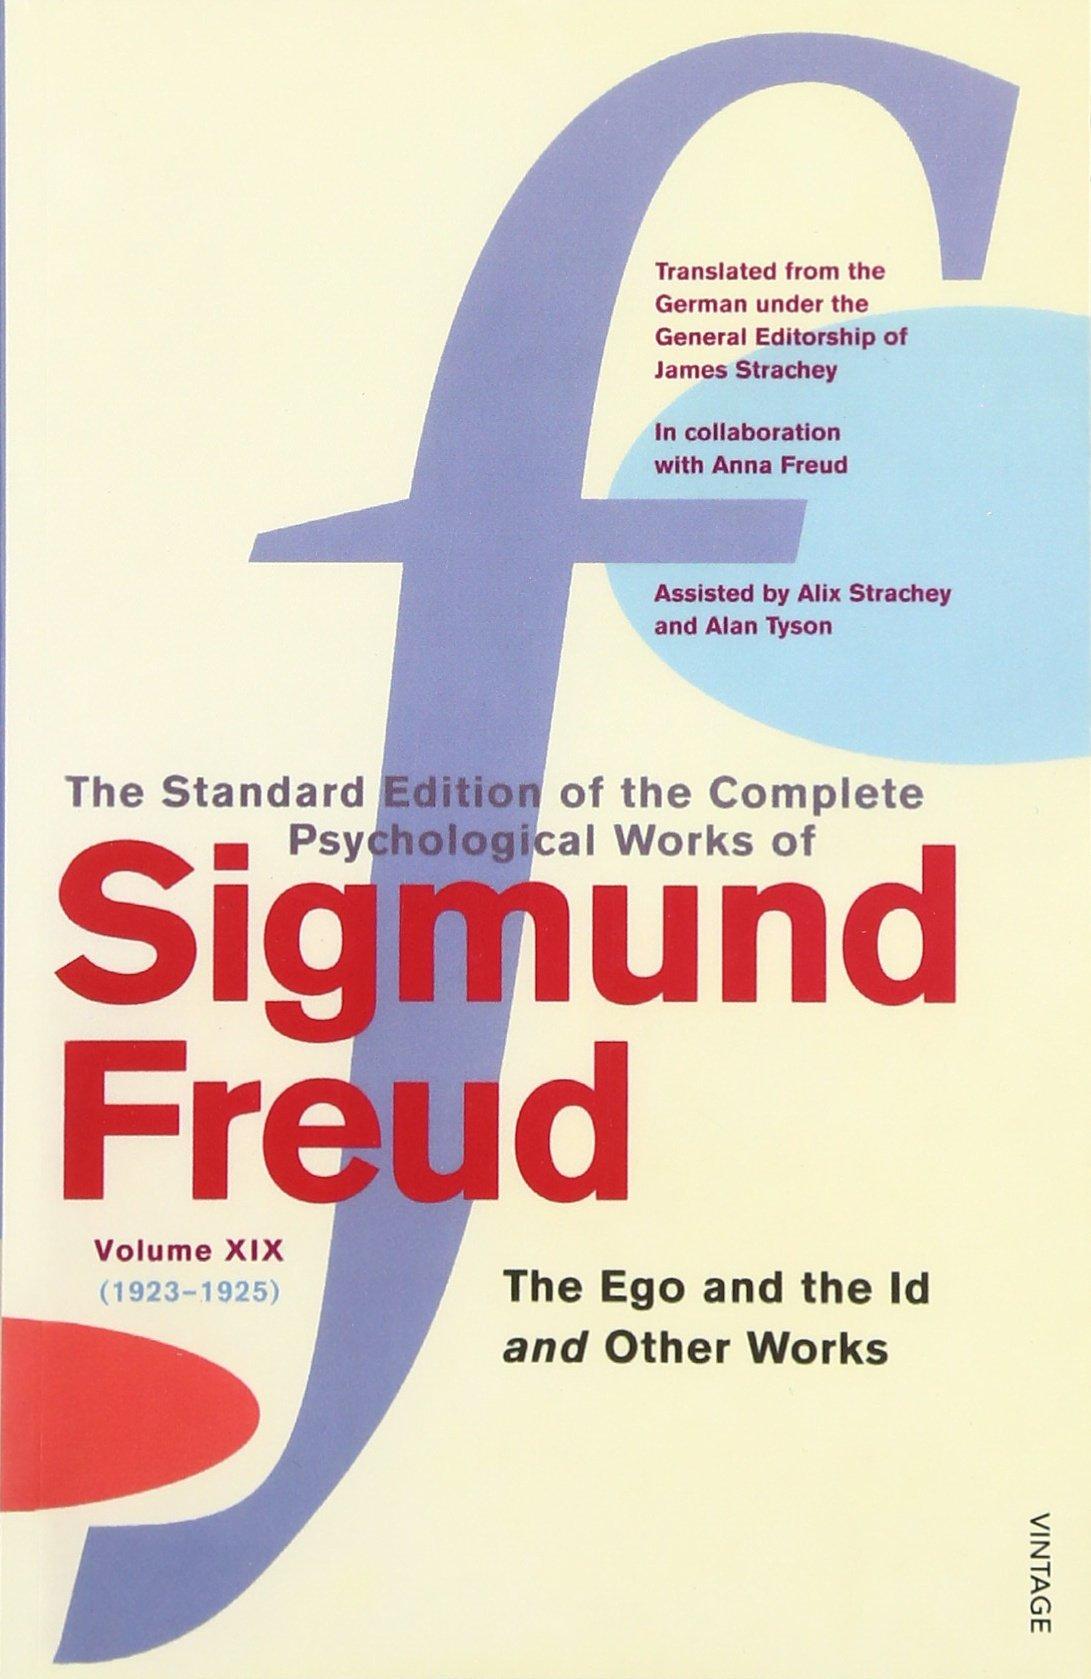 Complete Psychological Works Of Sigmund Freud The Vol 19 The Ego